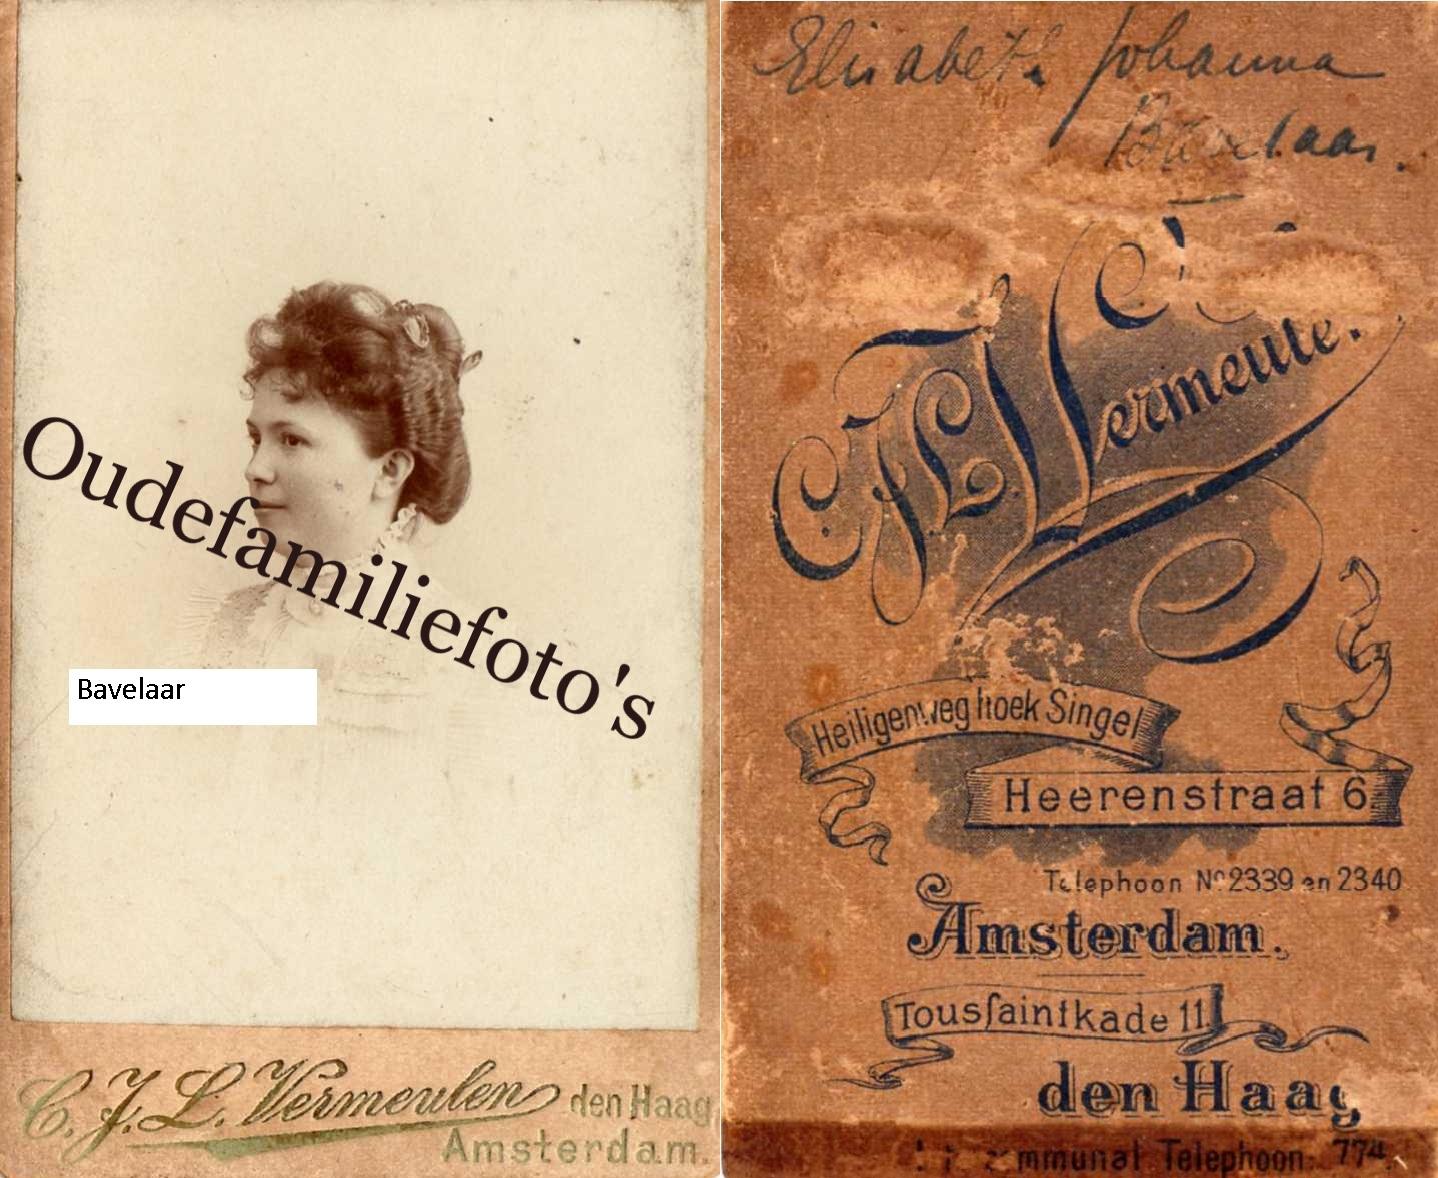 Bavelaar, Elisabeth Johanna. Geb. 30-4-1870 Amsterdam. Getrouwd met Jan Keppler. € 2,00